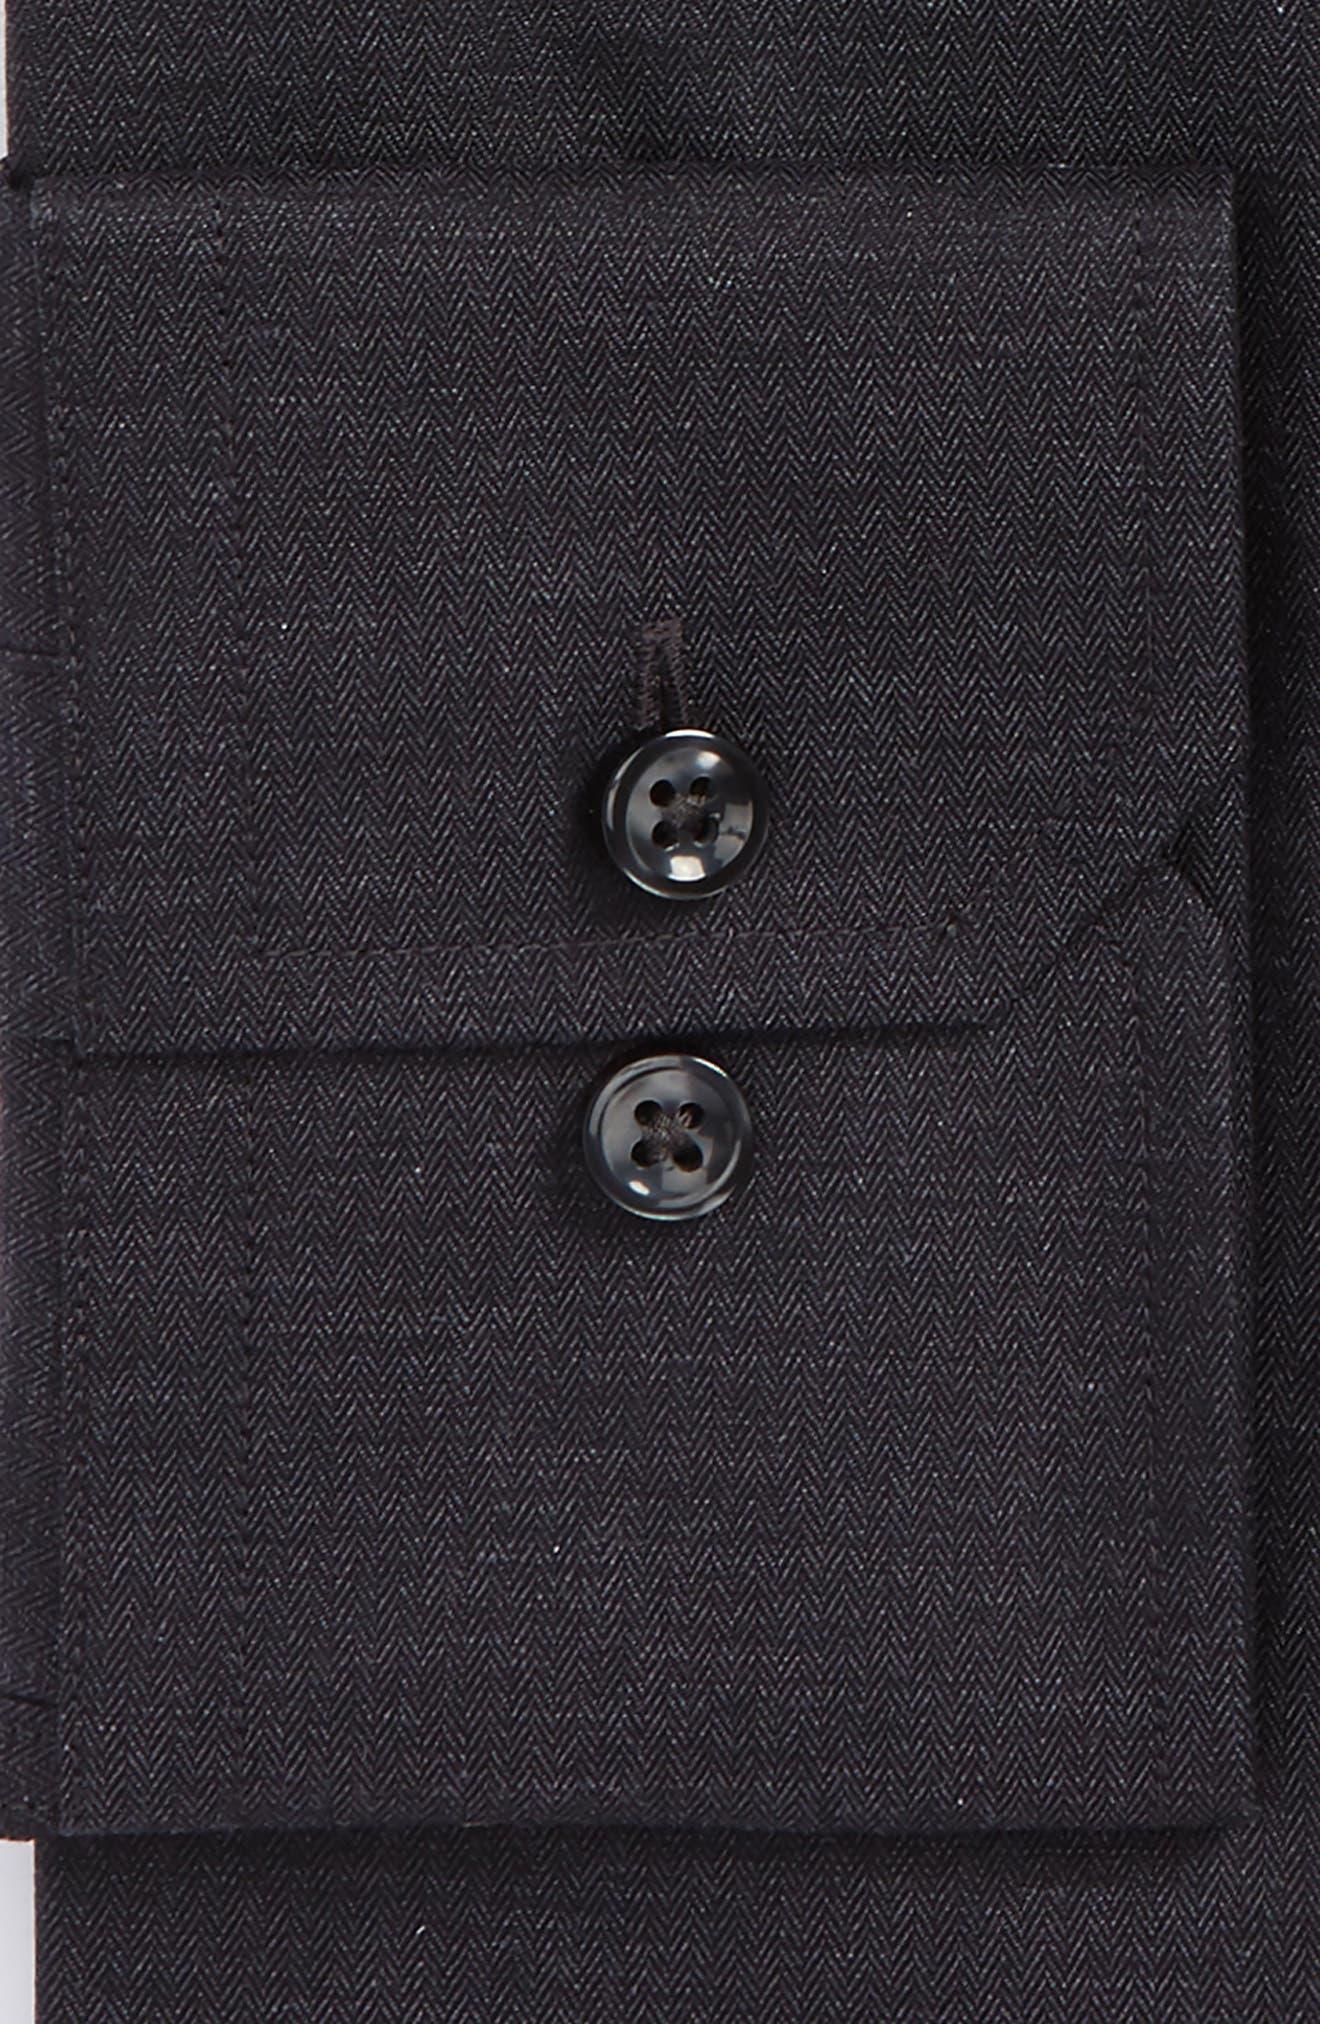 Trim Fit Herringbone Dress Shirt,                             Alternate thumbnail 4, color,